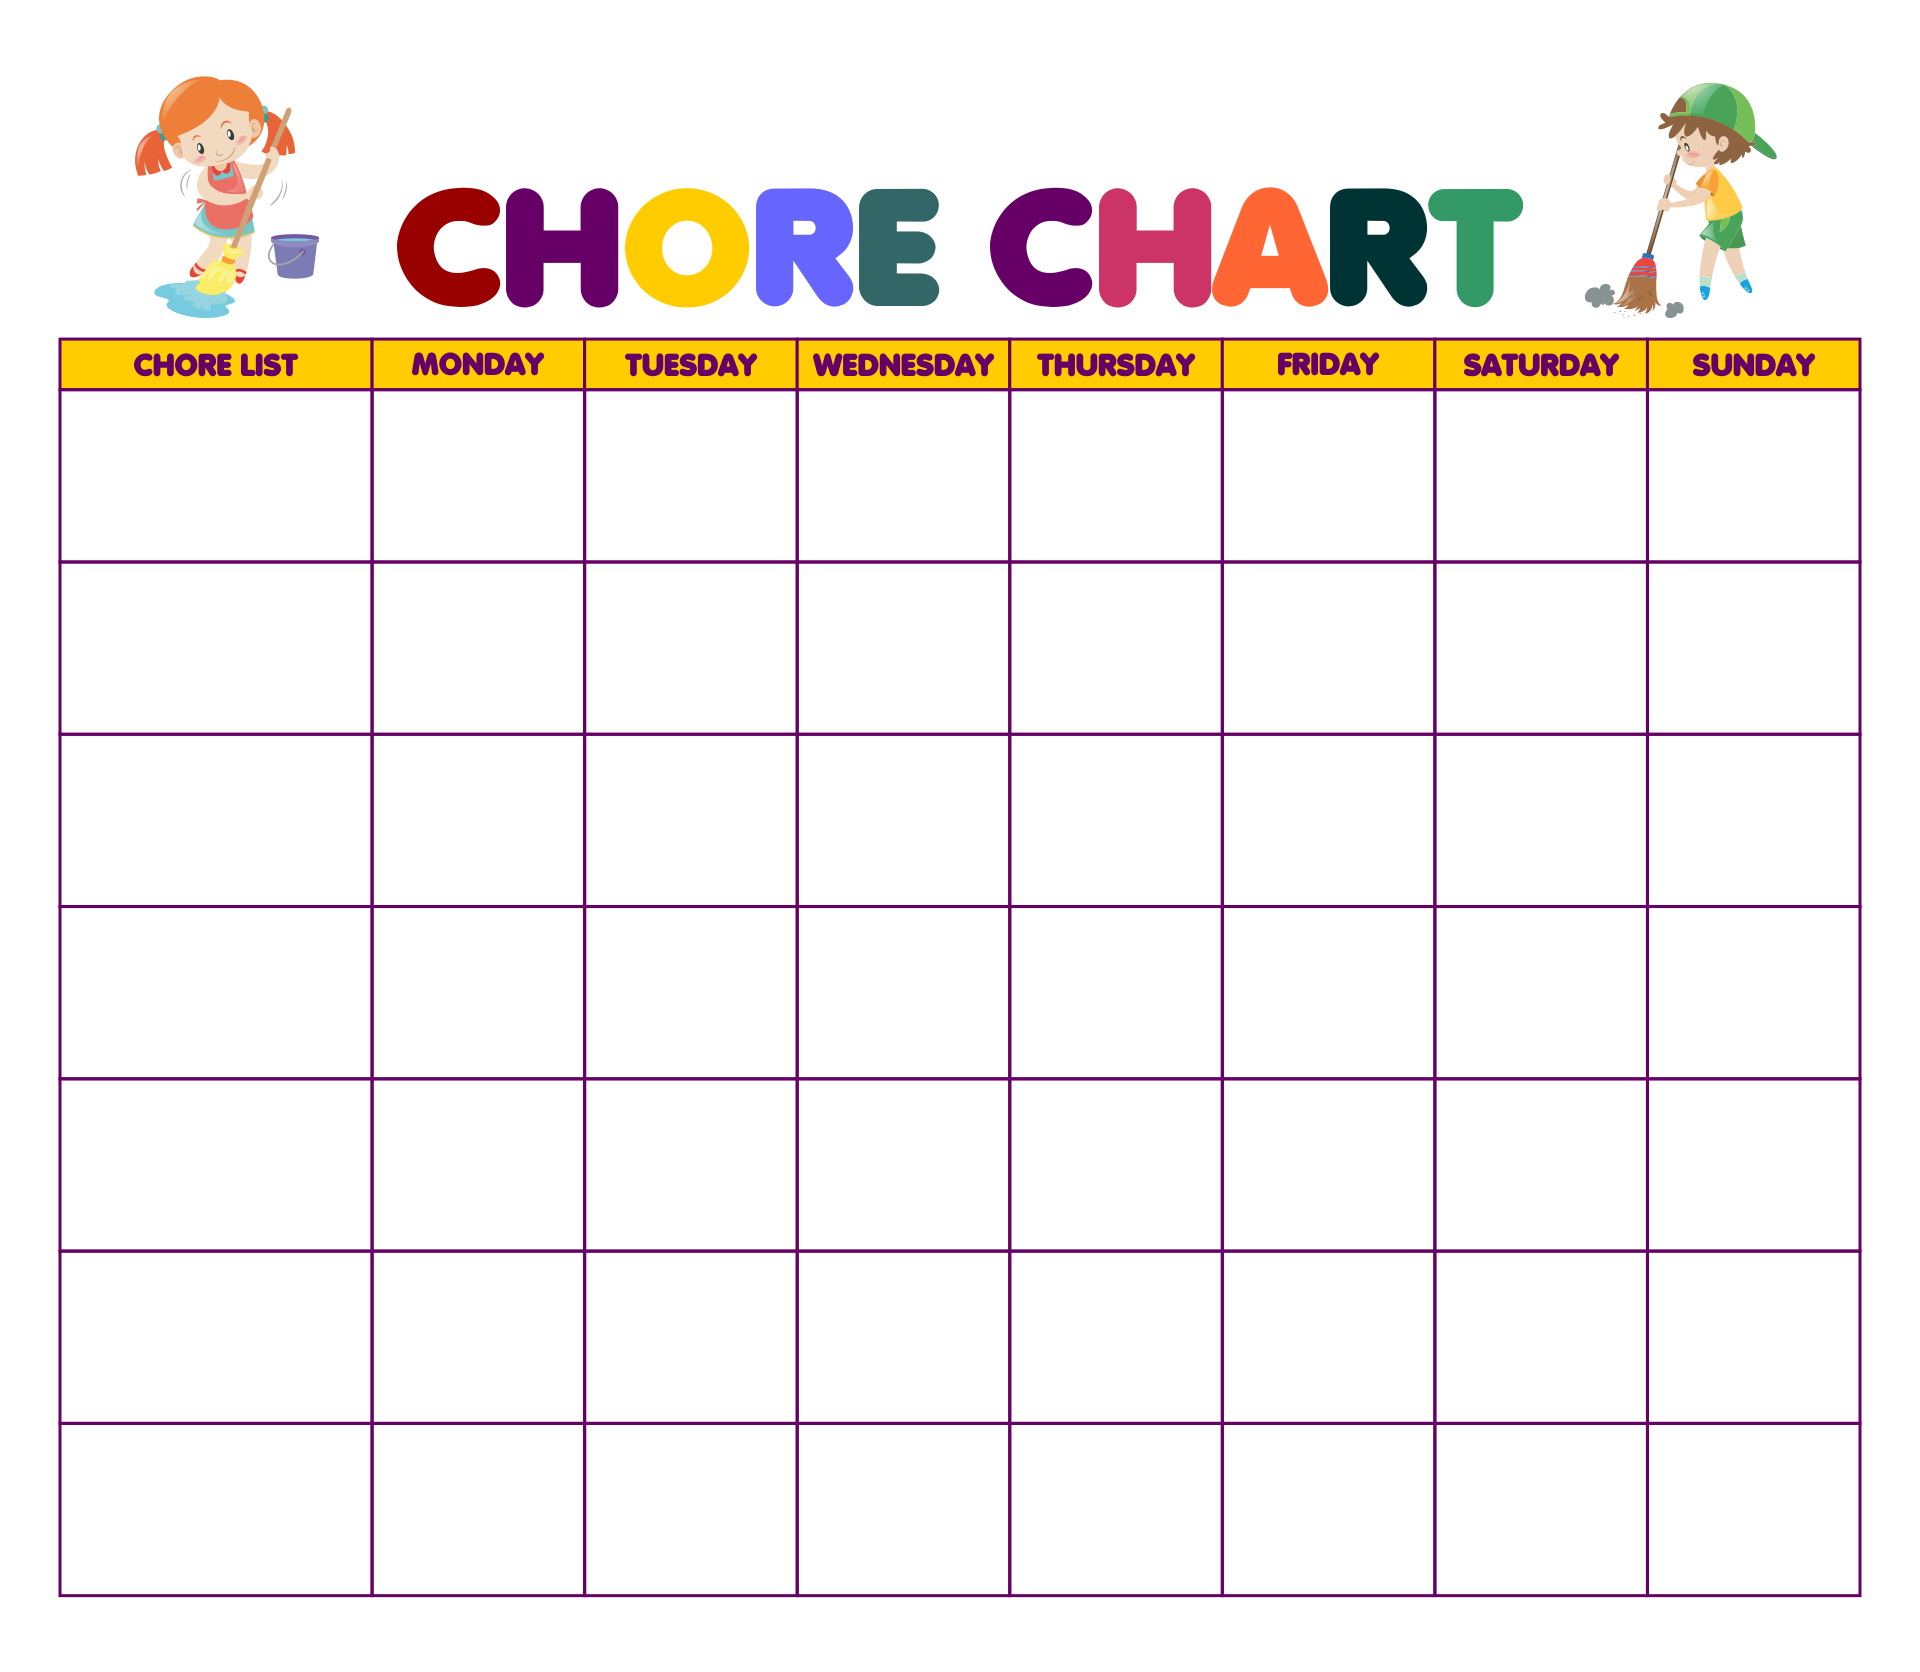 Daily Chores Charts Kids Printables